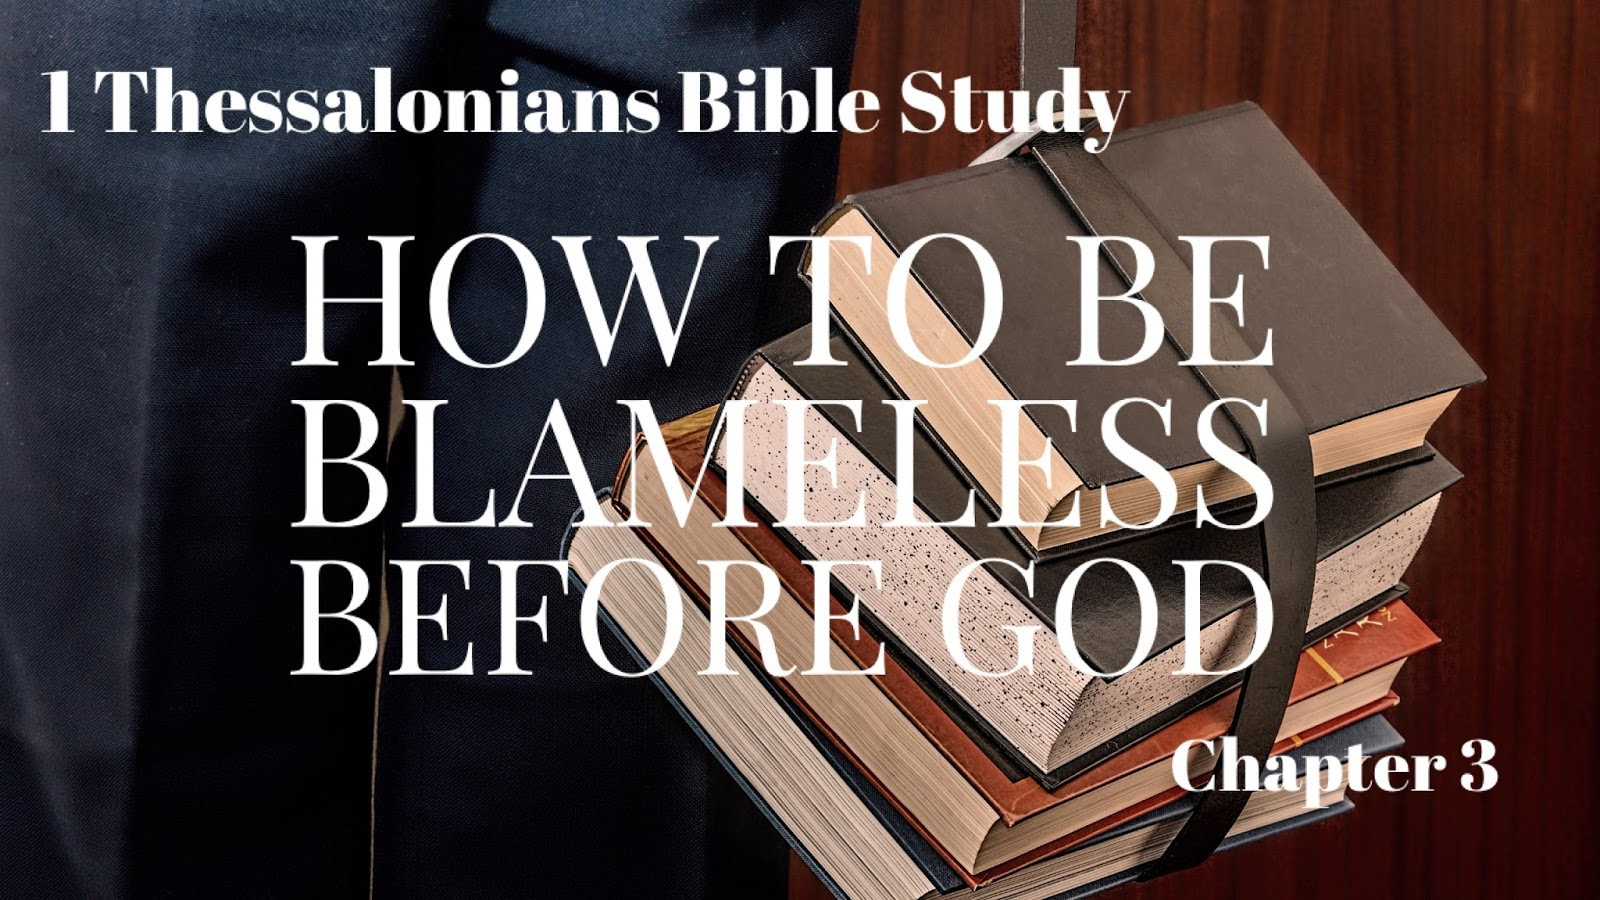 Blameless - Bible Study Tools